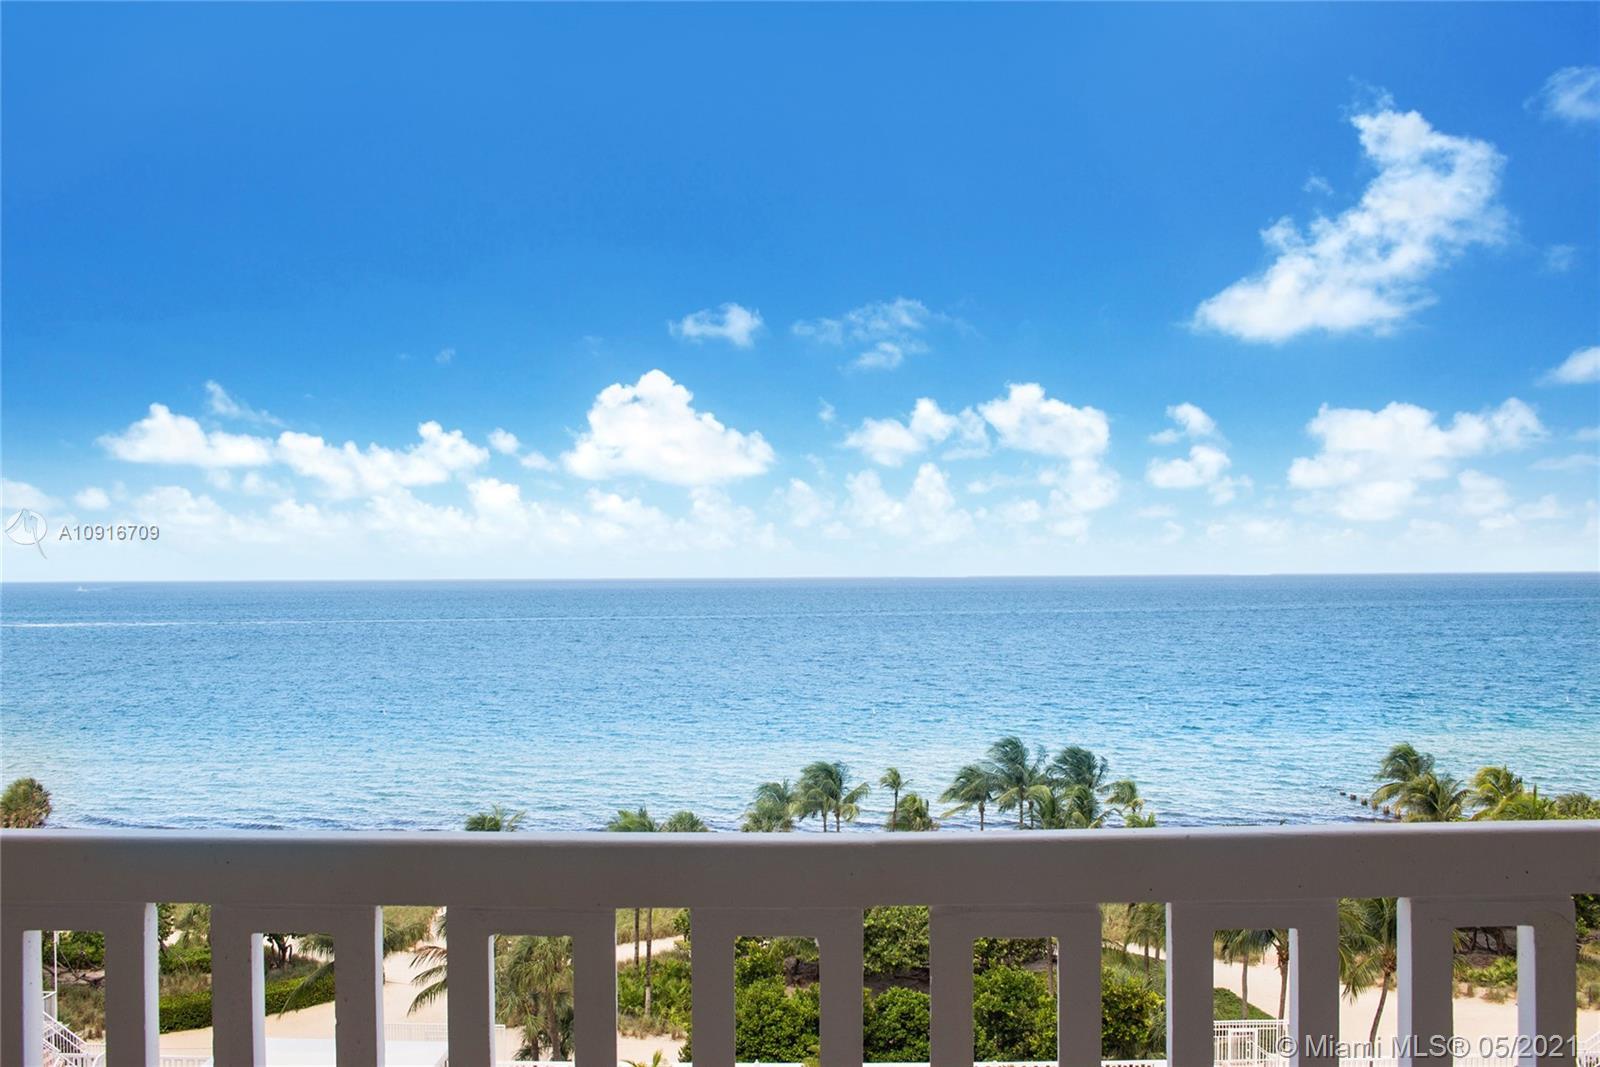 Photo of 9801 Collins Ave #11B Direct Ocean, Bal Harbour, Florida, 33154 - Direct Ocean views 11B